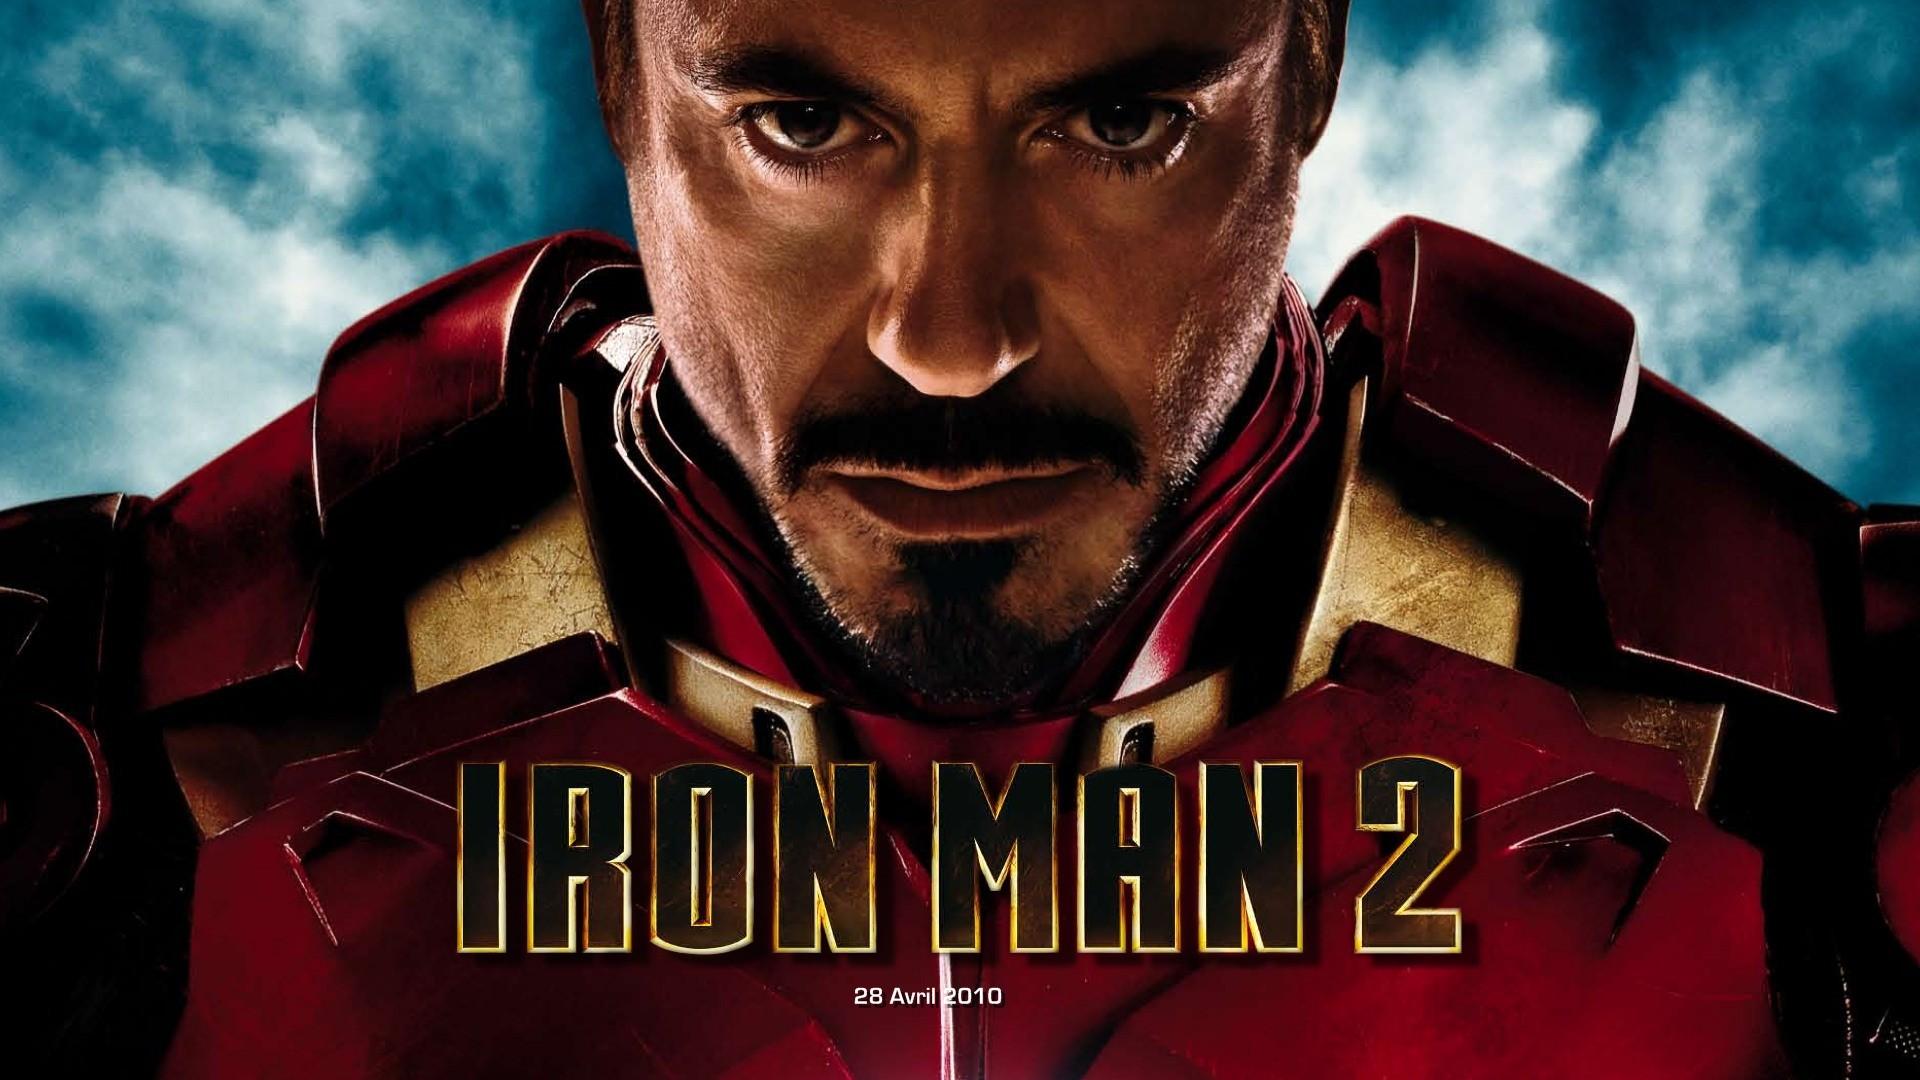 Wonderful Wallpaper Marvel Portrait - movies-movie-poster-superhero-Iron-Man-Marvel-Cinematic-Universe-Iron-Man-2-Robert-Downey-Jr-Tony-Stark-screenshot-computer-wallpaper-fictional-character-action-film-230124  Snapshot_856621.jpg